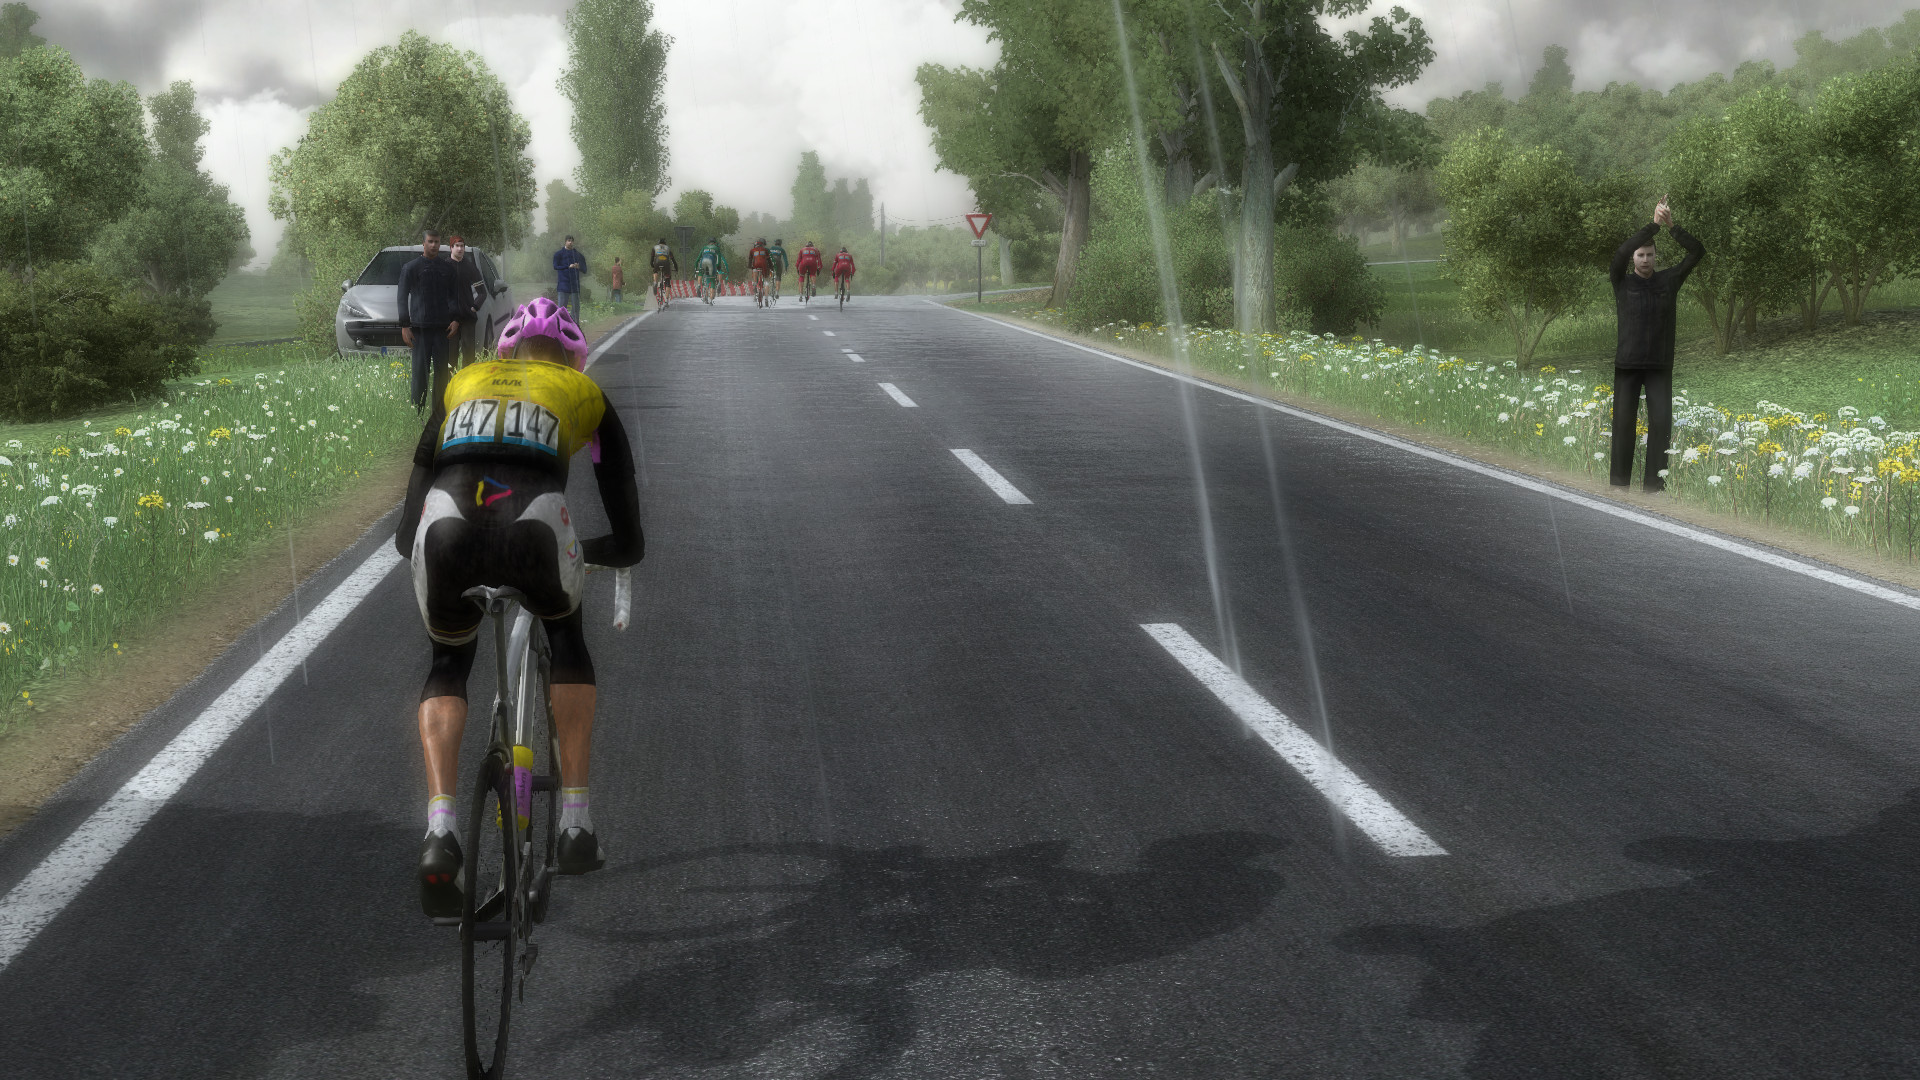 pcmdaily.com/images/mg/2019/Races/PTHC/Pologne/E5/14.jpg